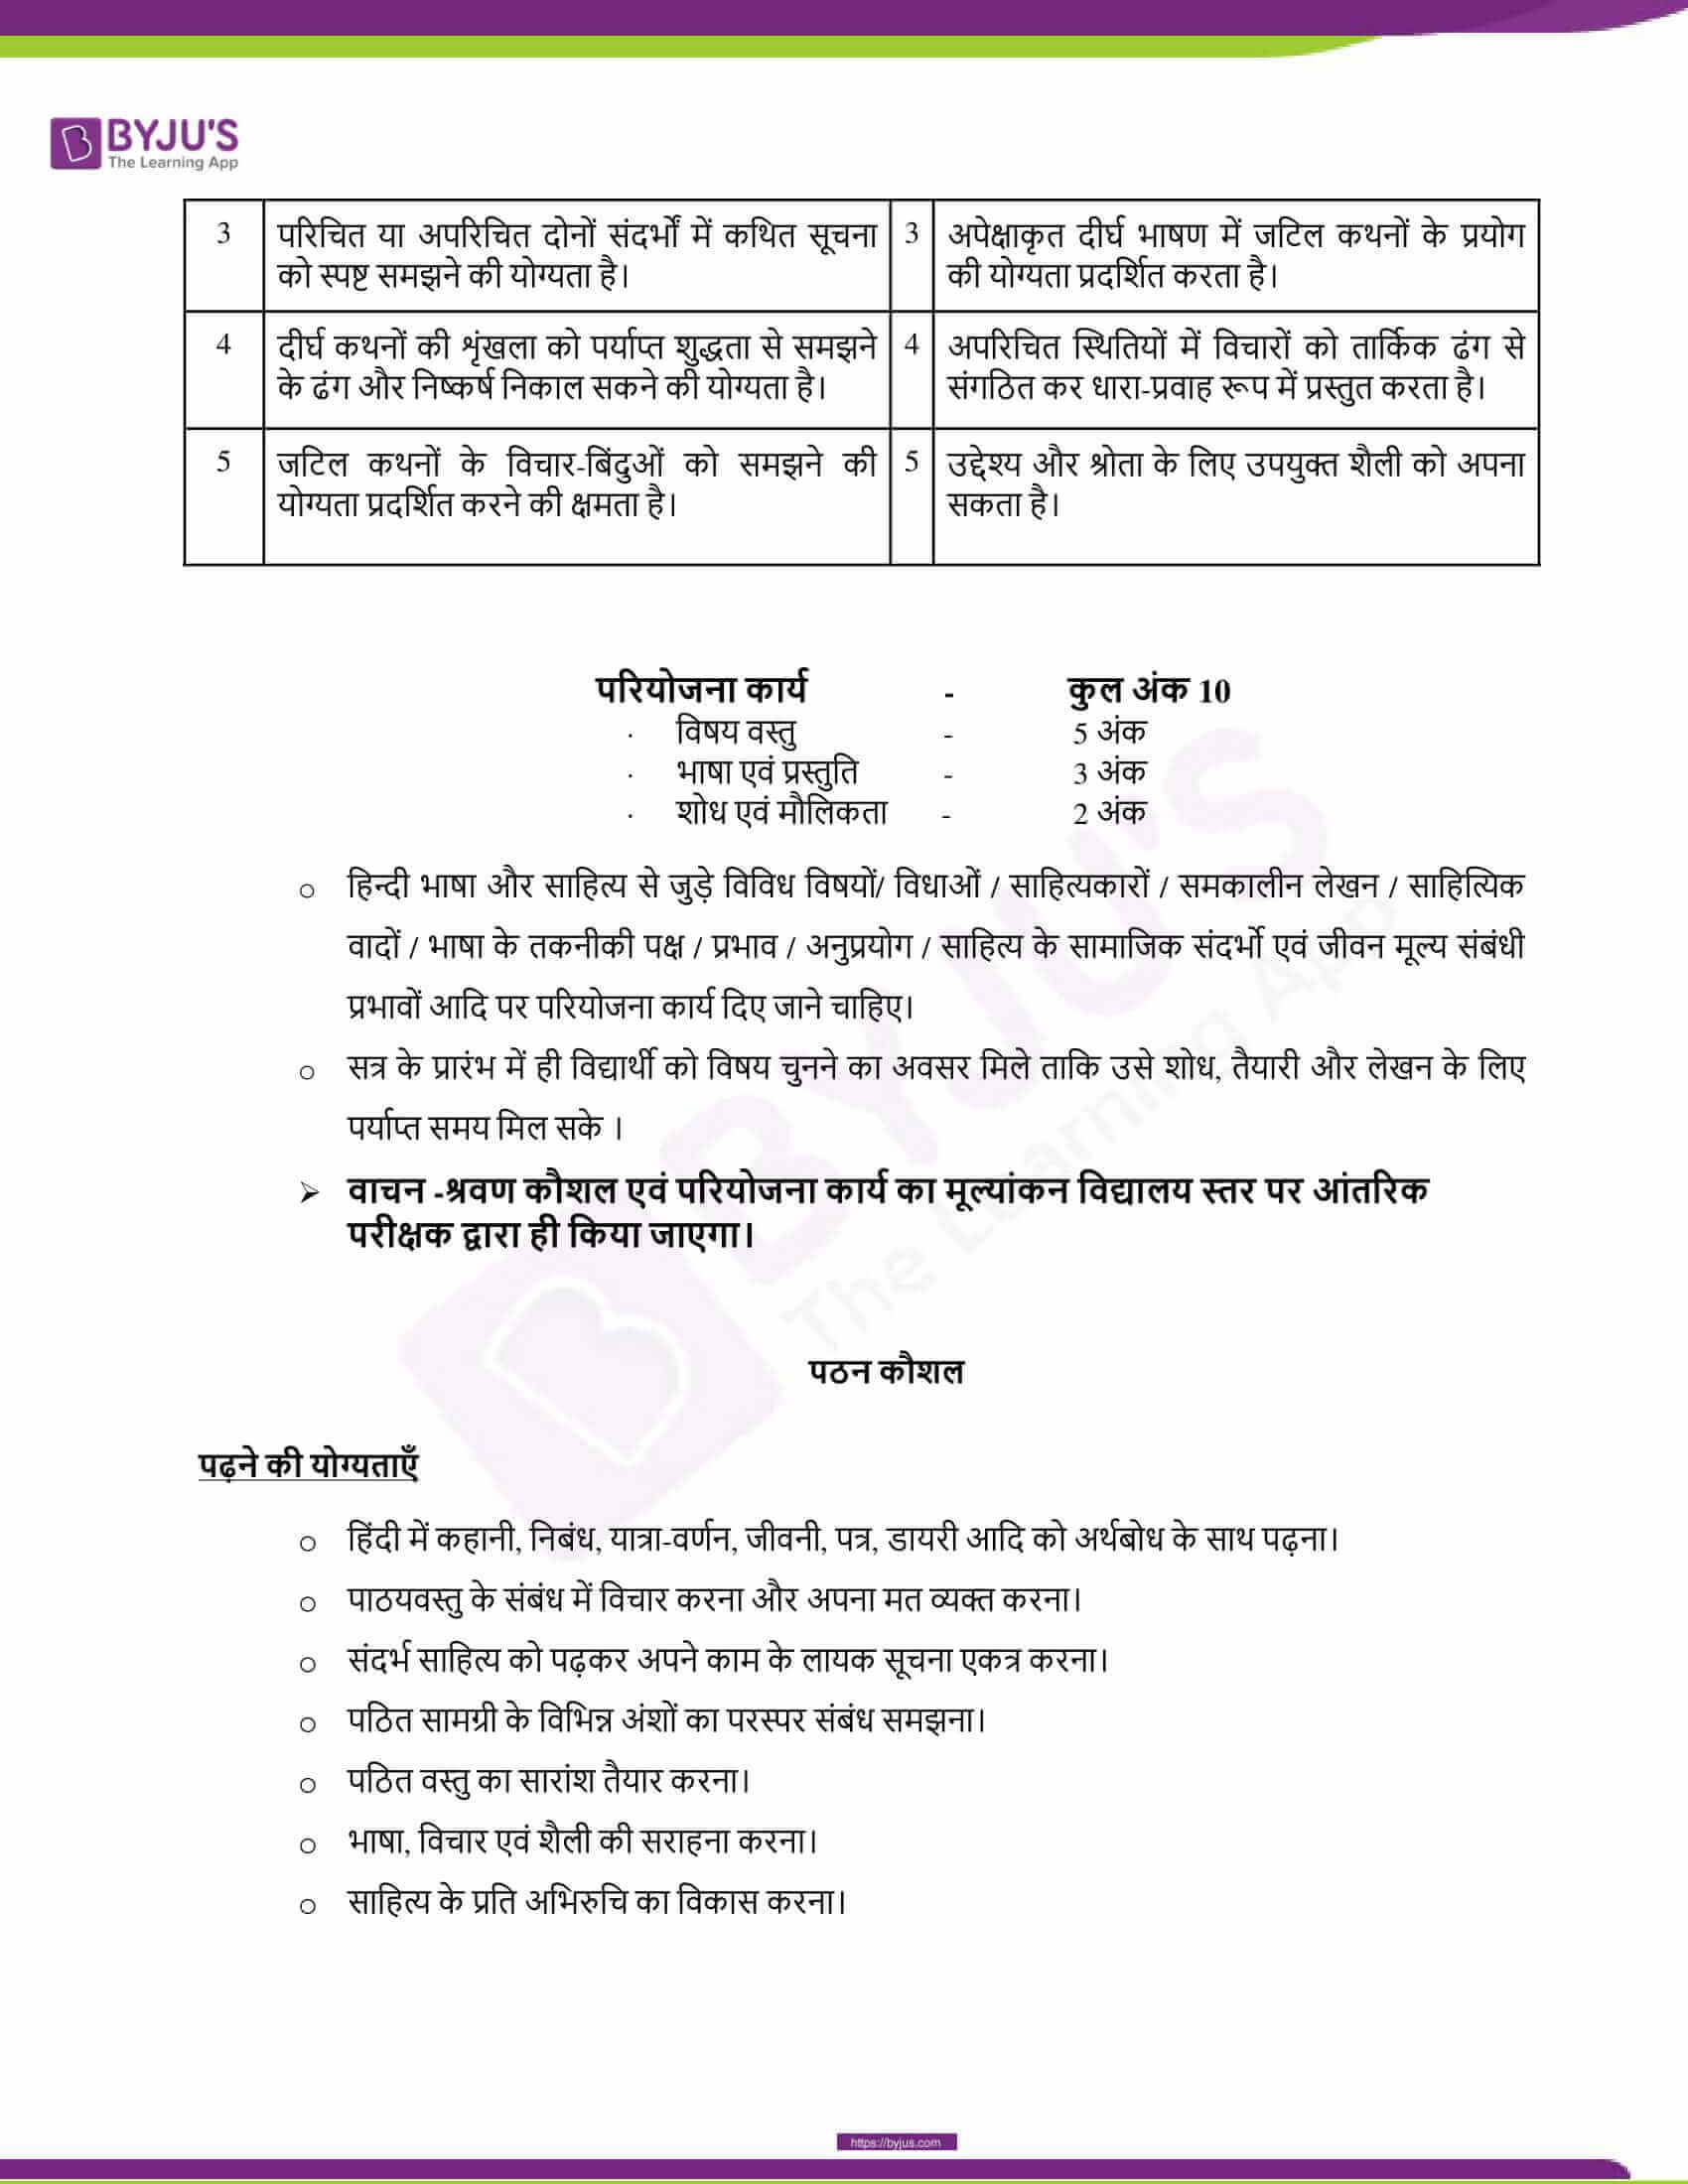 CBSE Class 10 Hindi Course B Revised Syllabus 2020 21 04